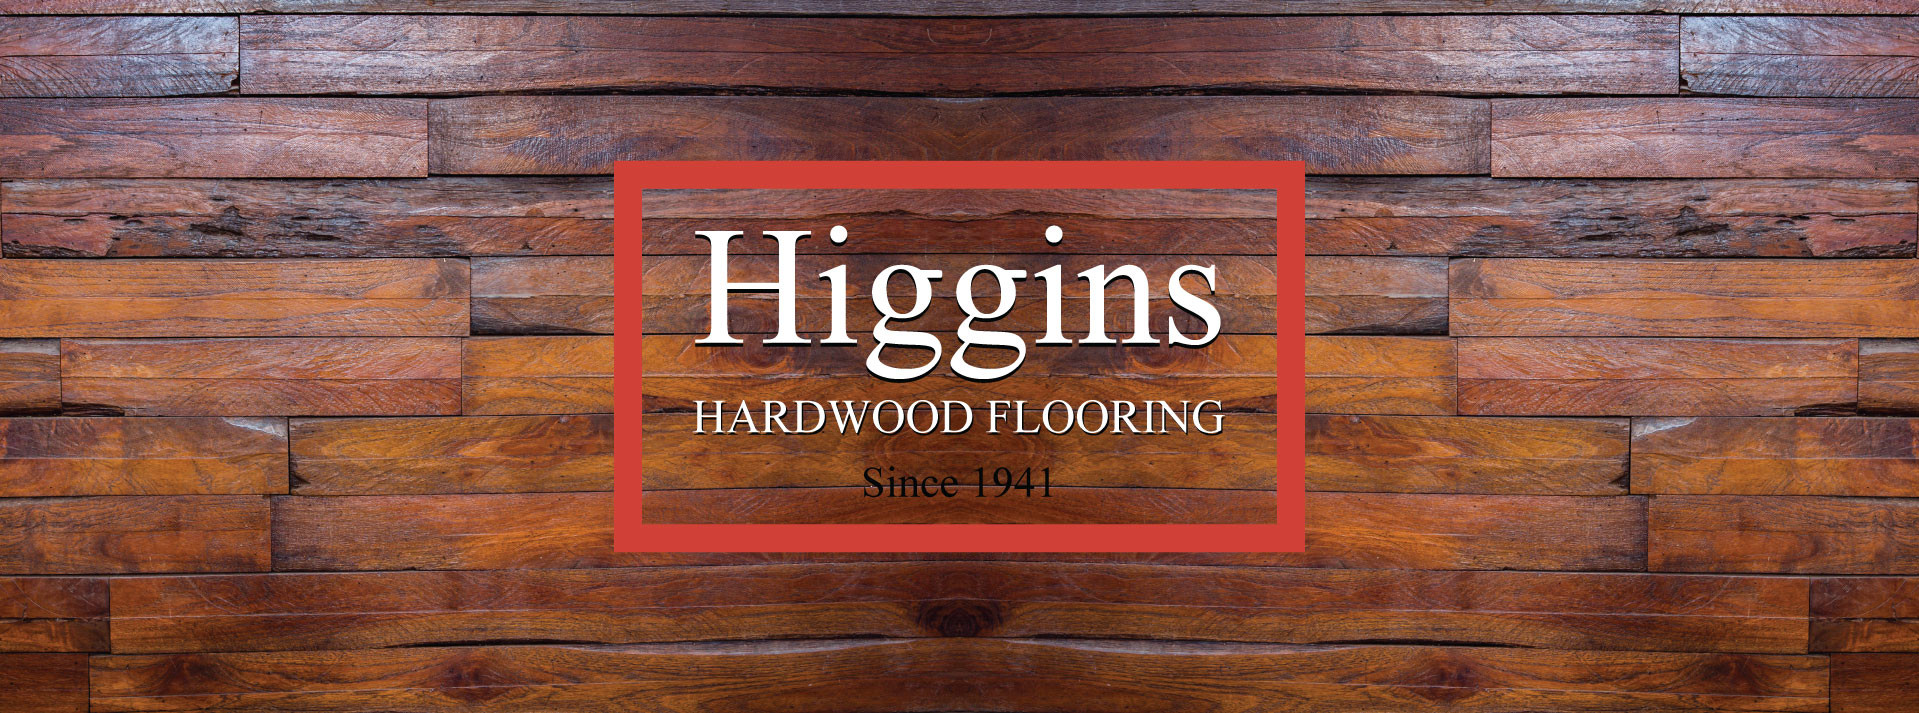 hardwood flooring auction ontario of higgins hardwood flooring in peterborough oshawa lindsay ajax regarding office hours